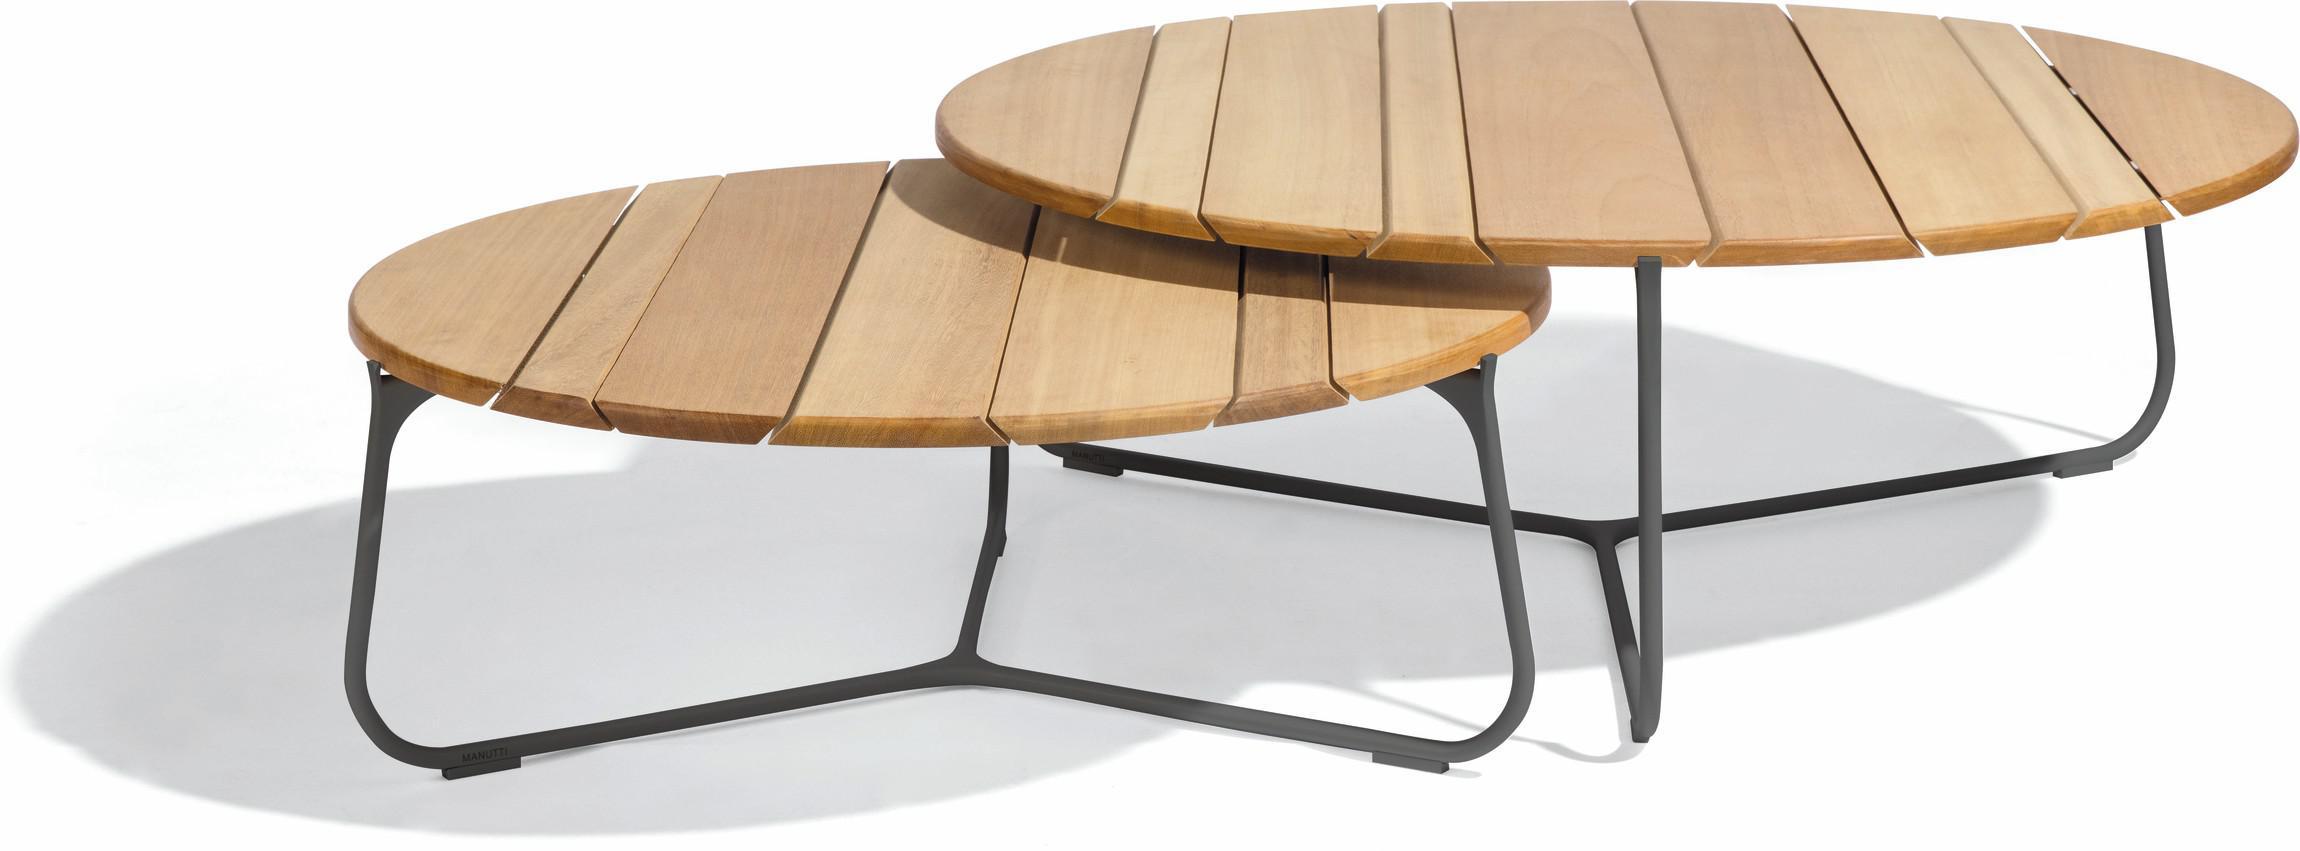 Mood coffee table - lava - iroko IR - 100